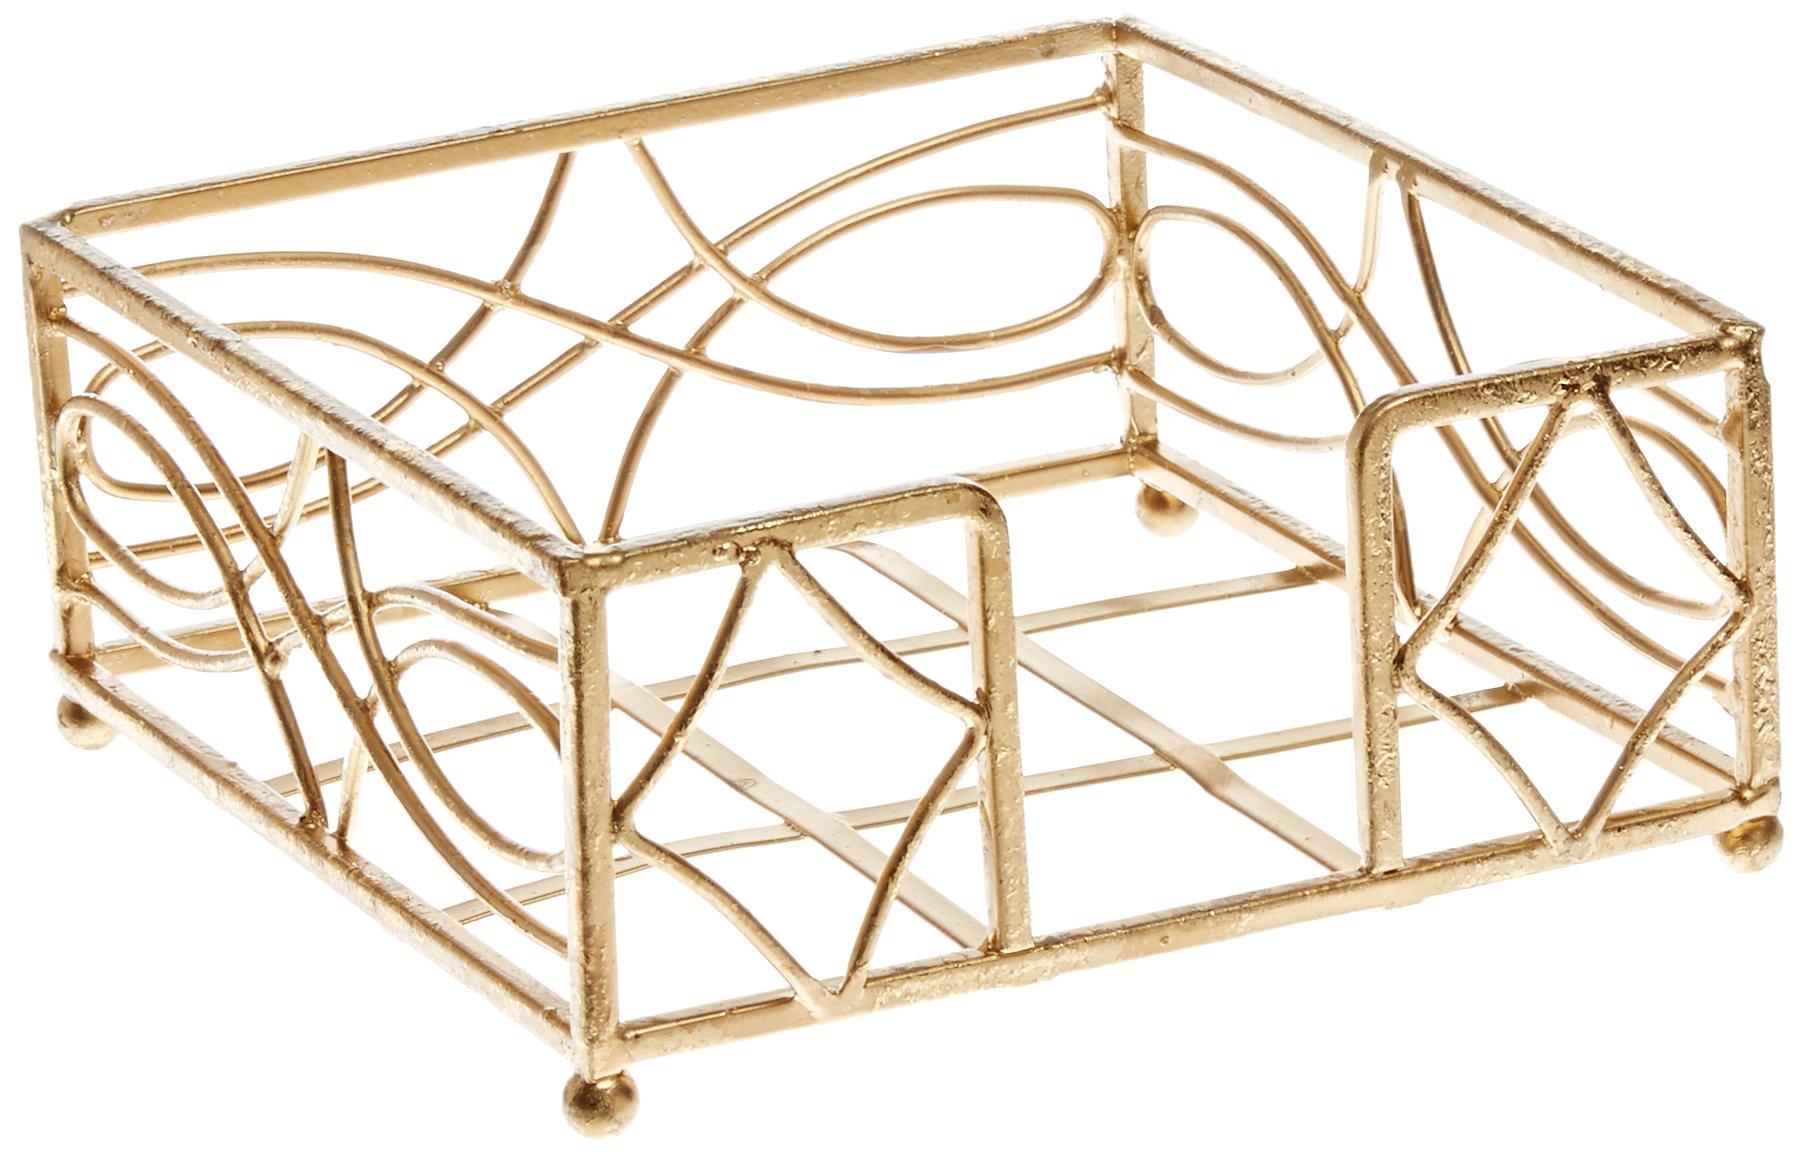 Boston International Cocktail Napkin Caddy, Wave Design in Gold Leaf by Boston International